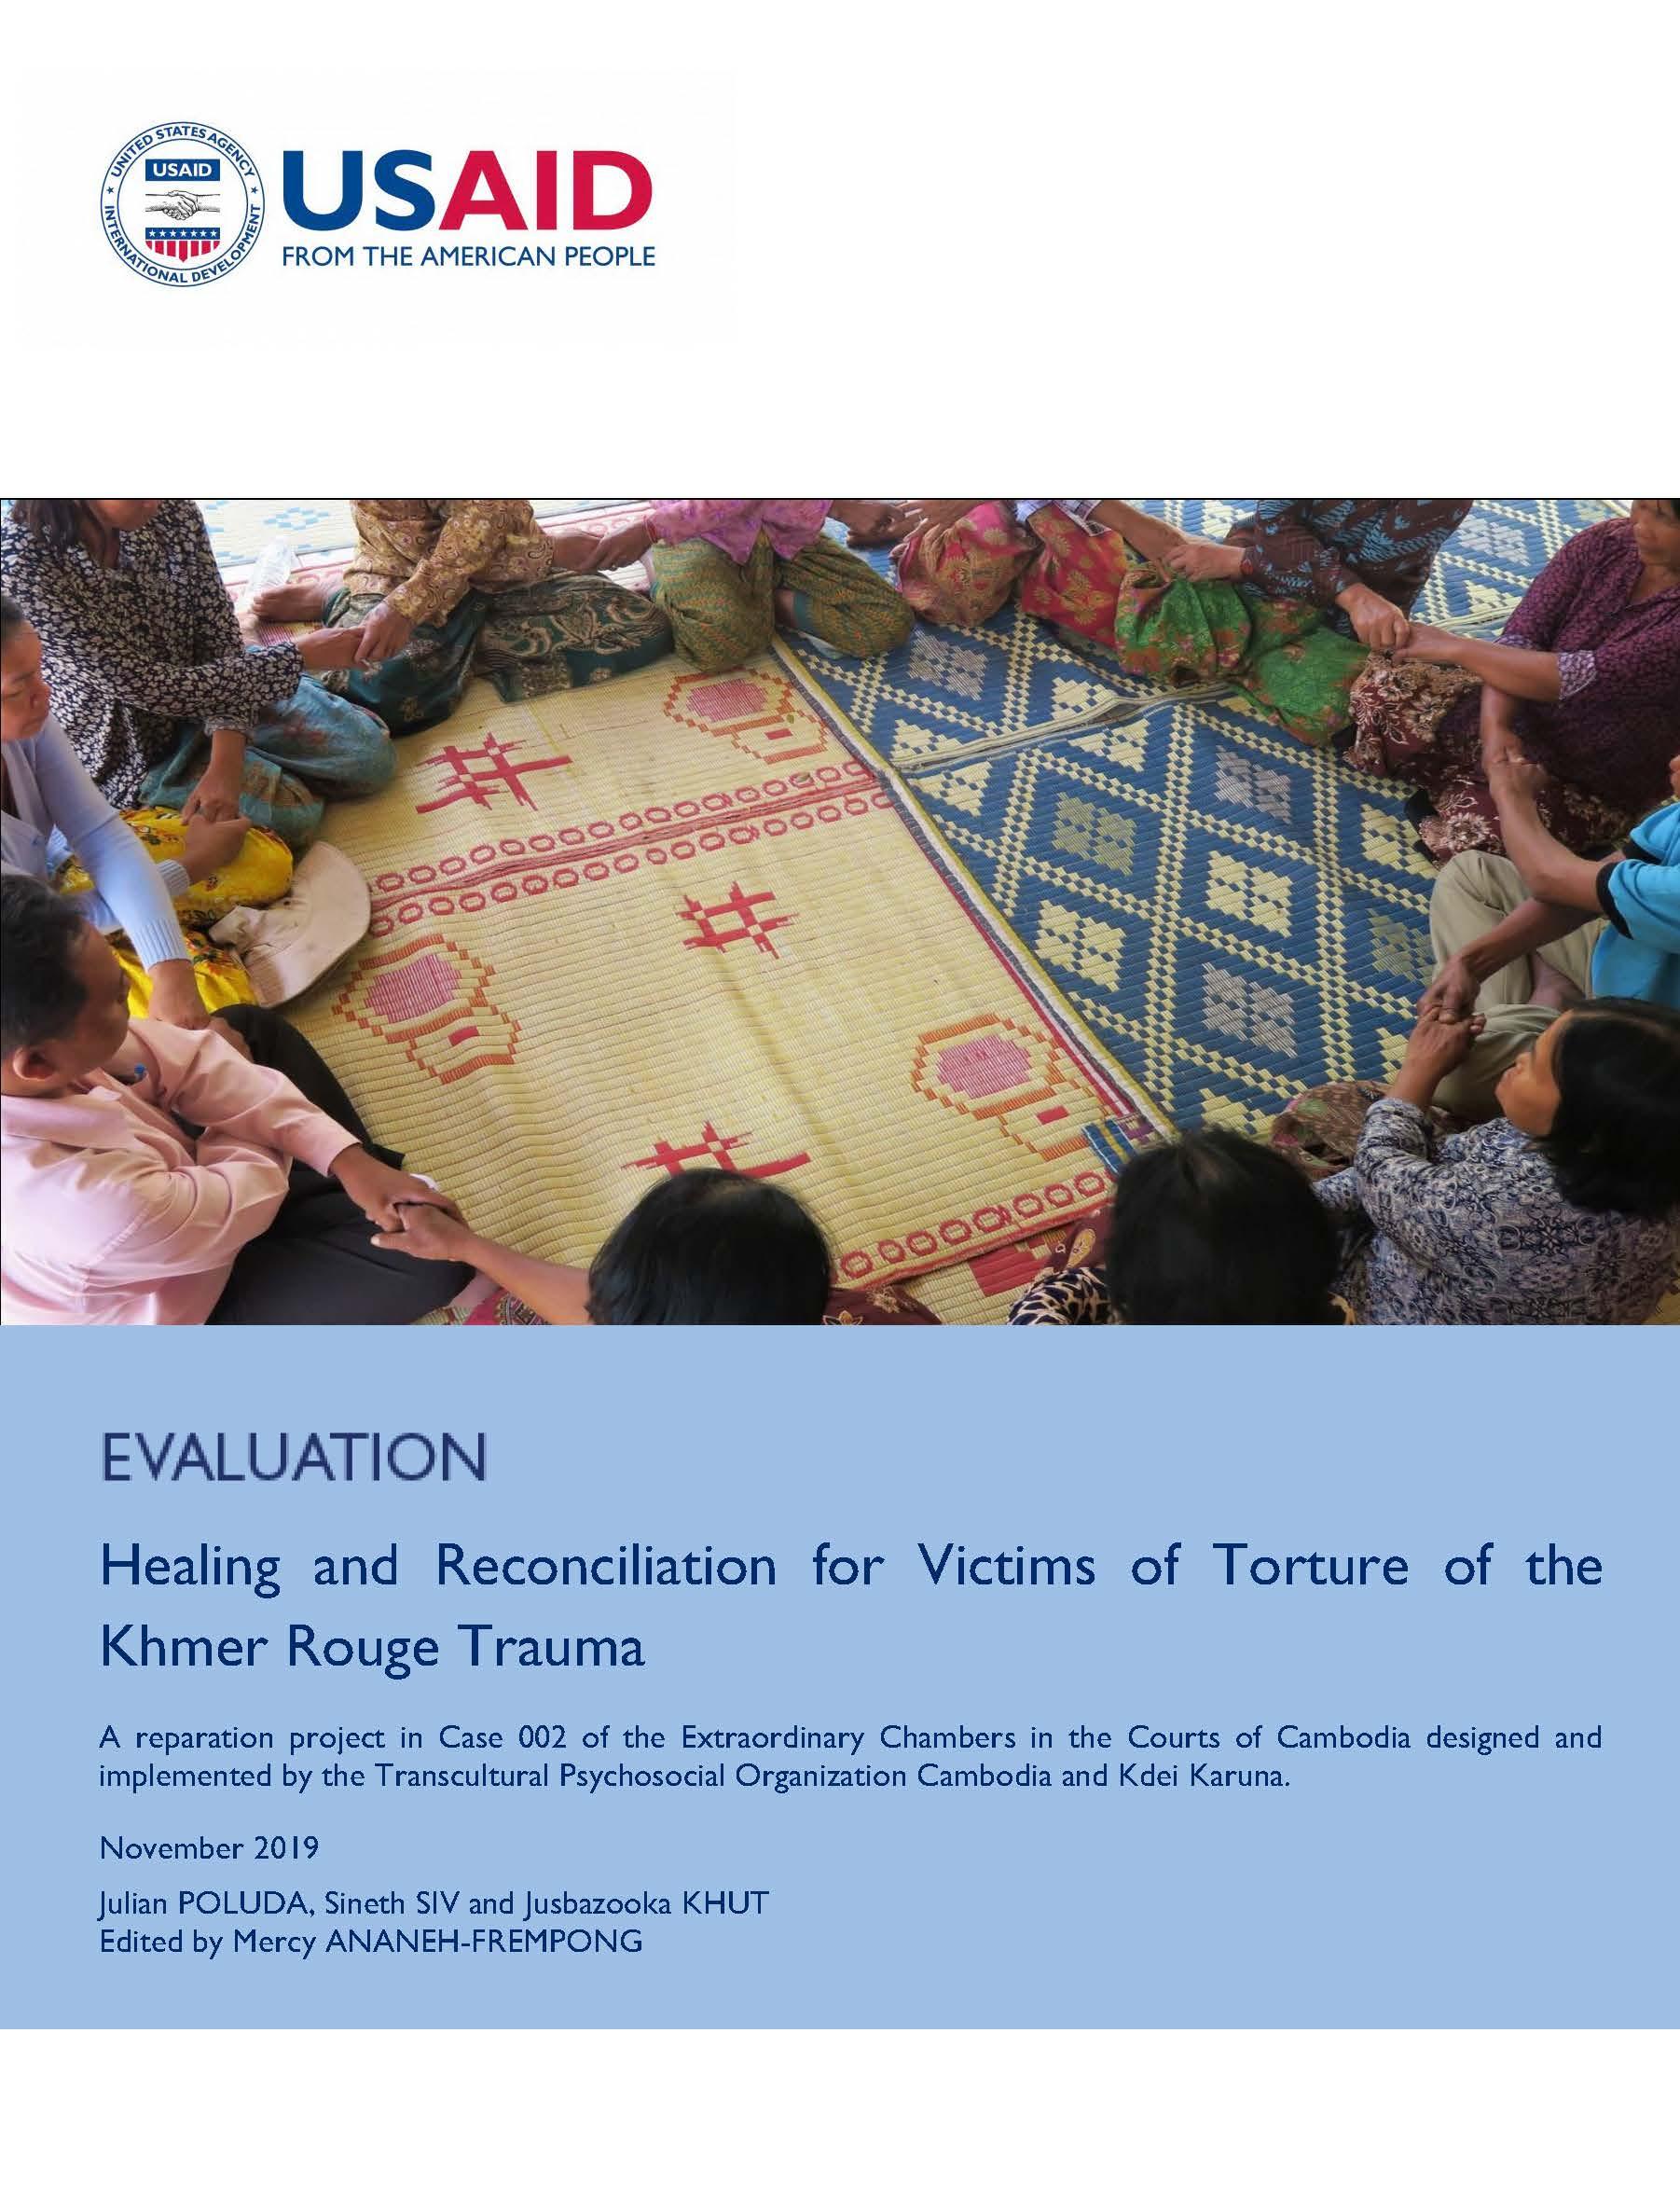 USAID_Cambodia_TPO_KdK_Evaluation Report_Poluda_Jan 2020 (English)